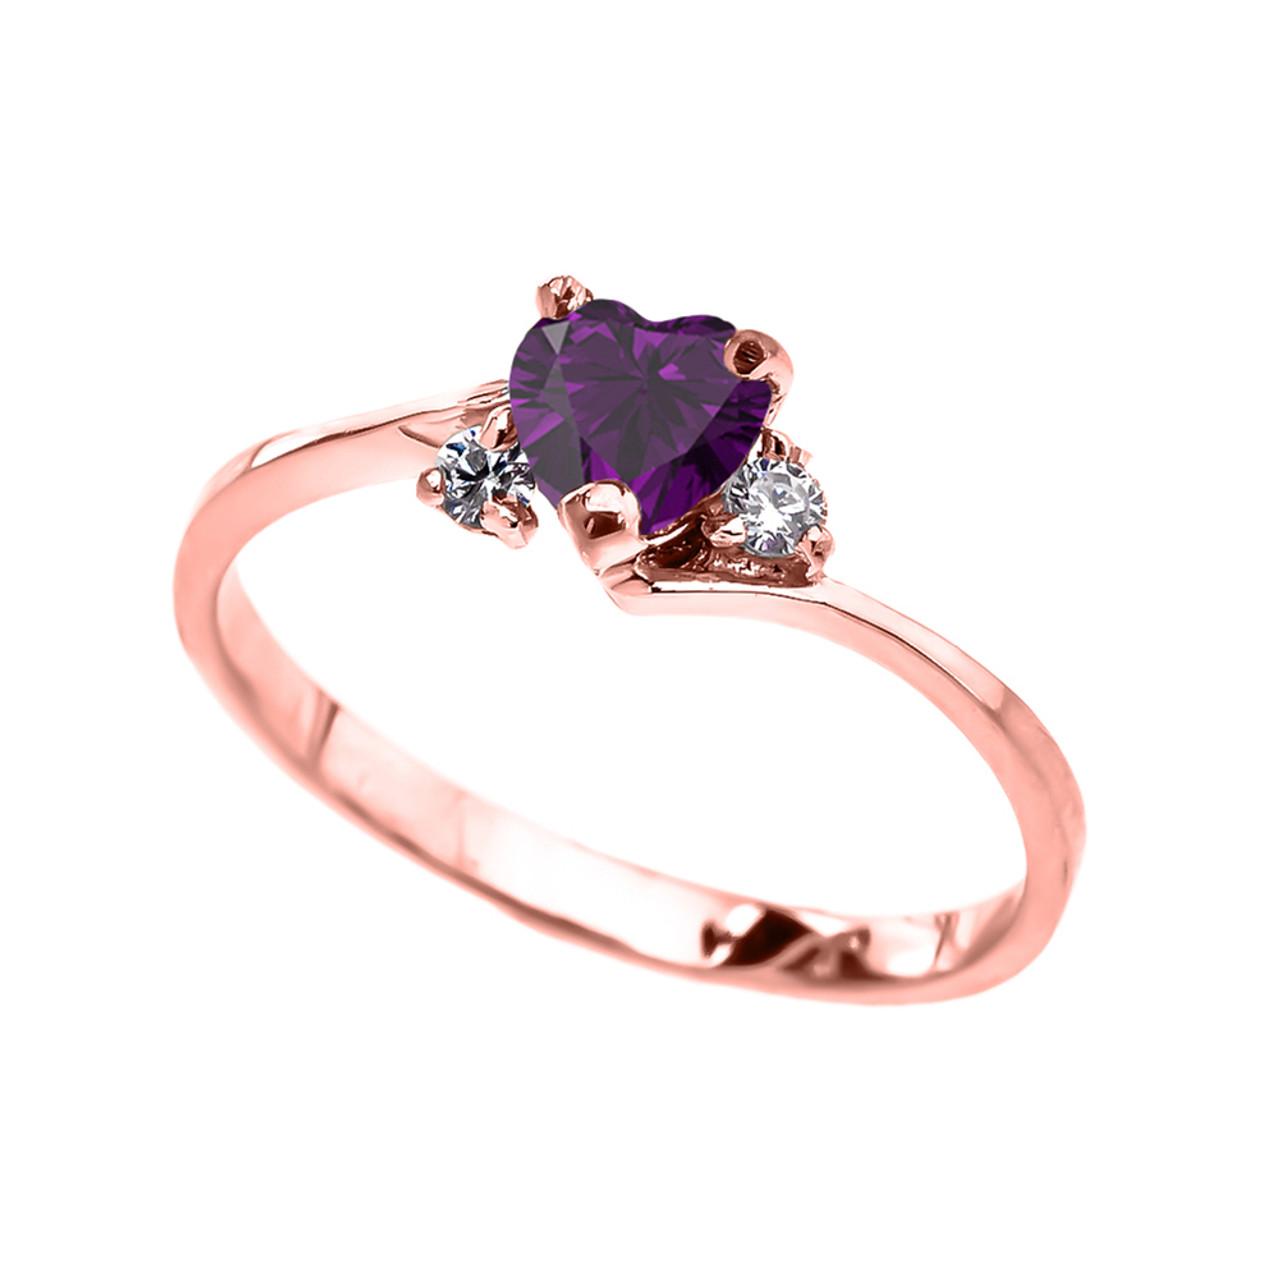 dainty rose gold cz amethyst heart promise ring. Black Bedroom Furniture Sets. Home Design Ideas